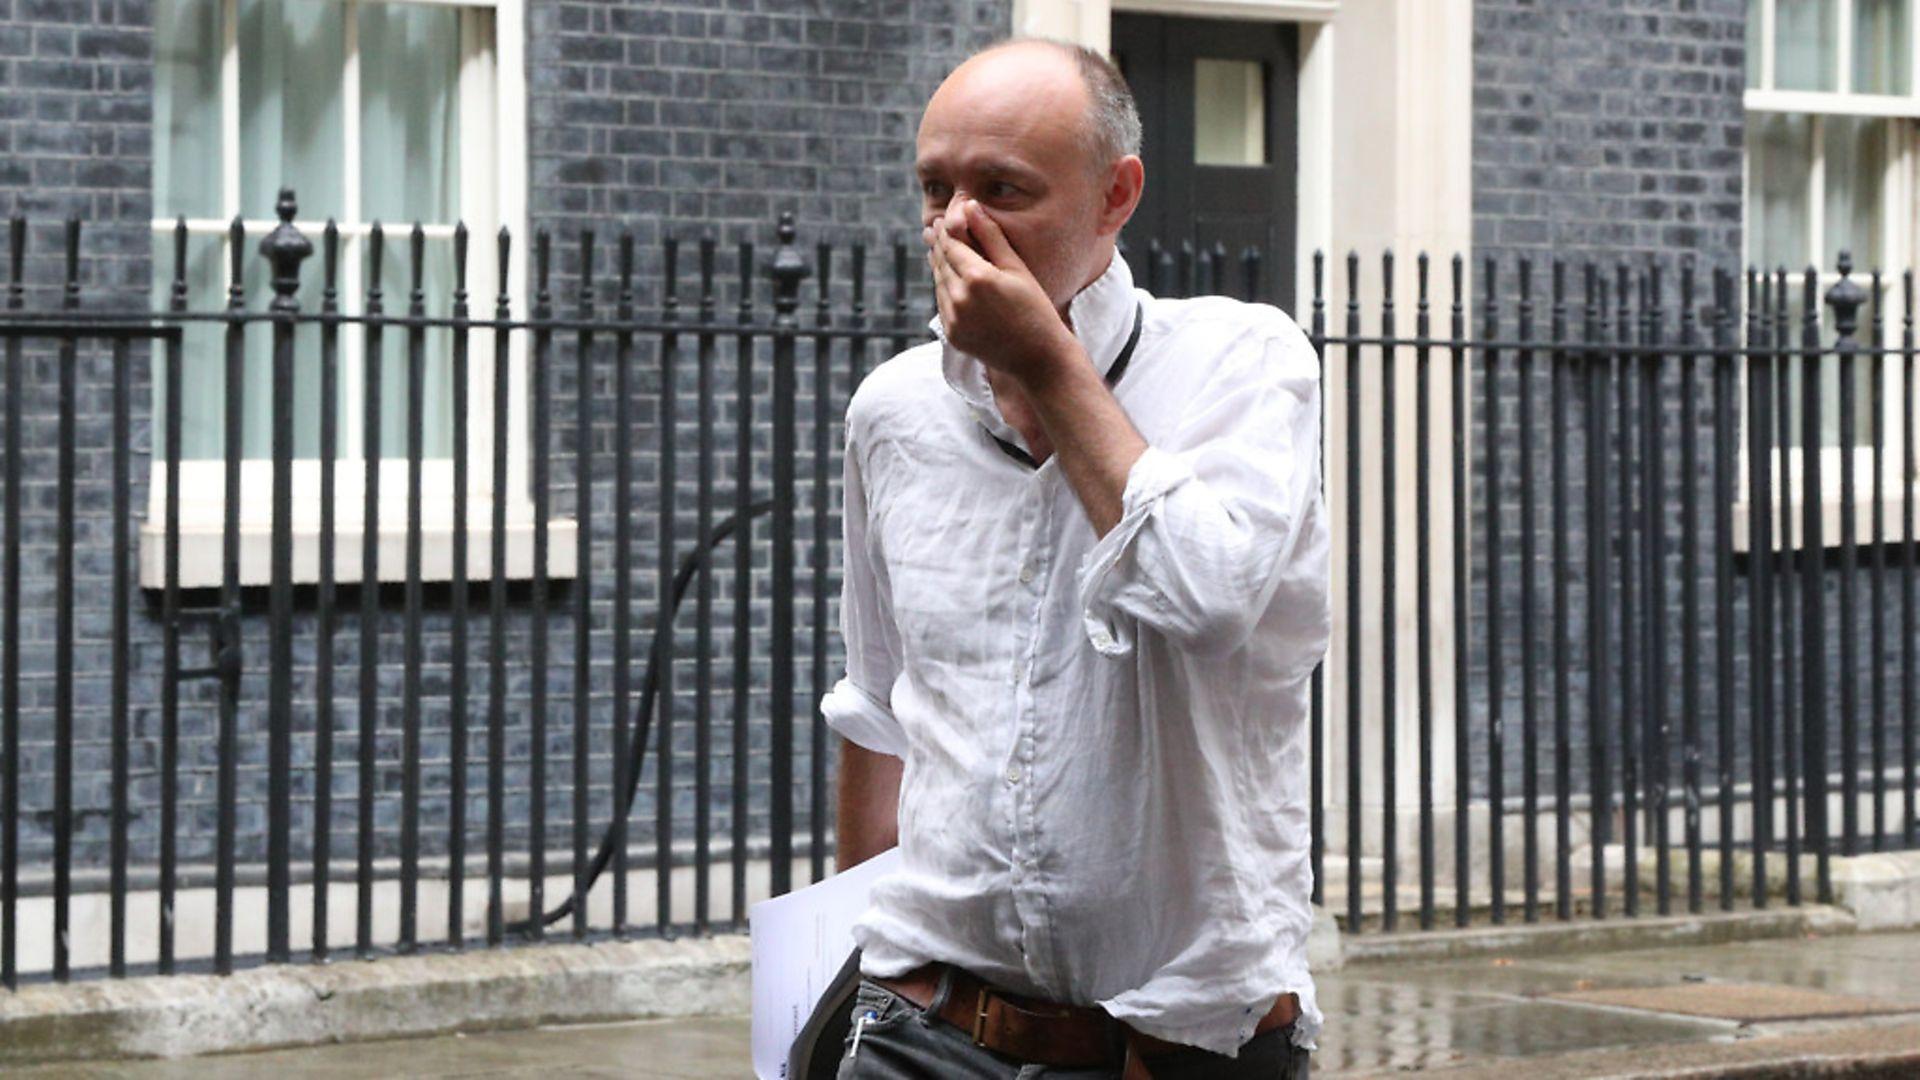 Dominic Cummings leaving Downing Street. Photograph: Jonathan Brady/PA. - Credit: PA Wire/PA Images